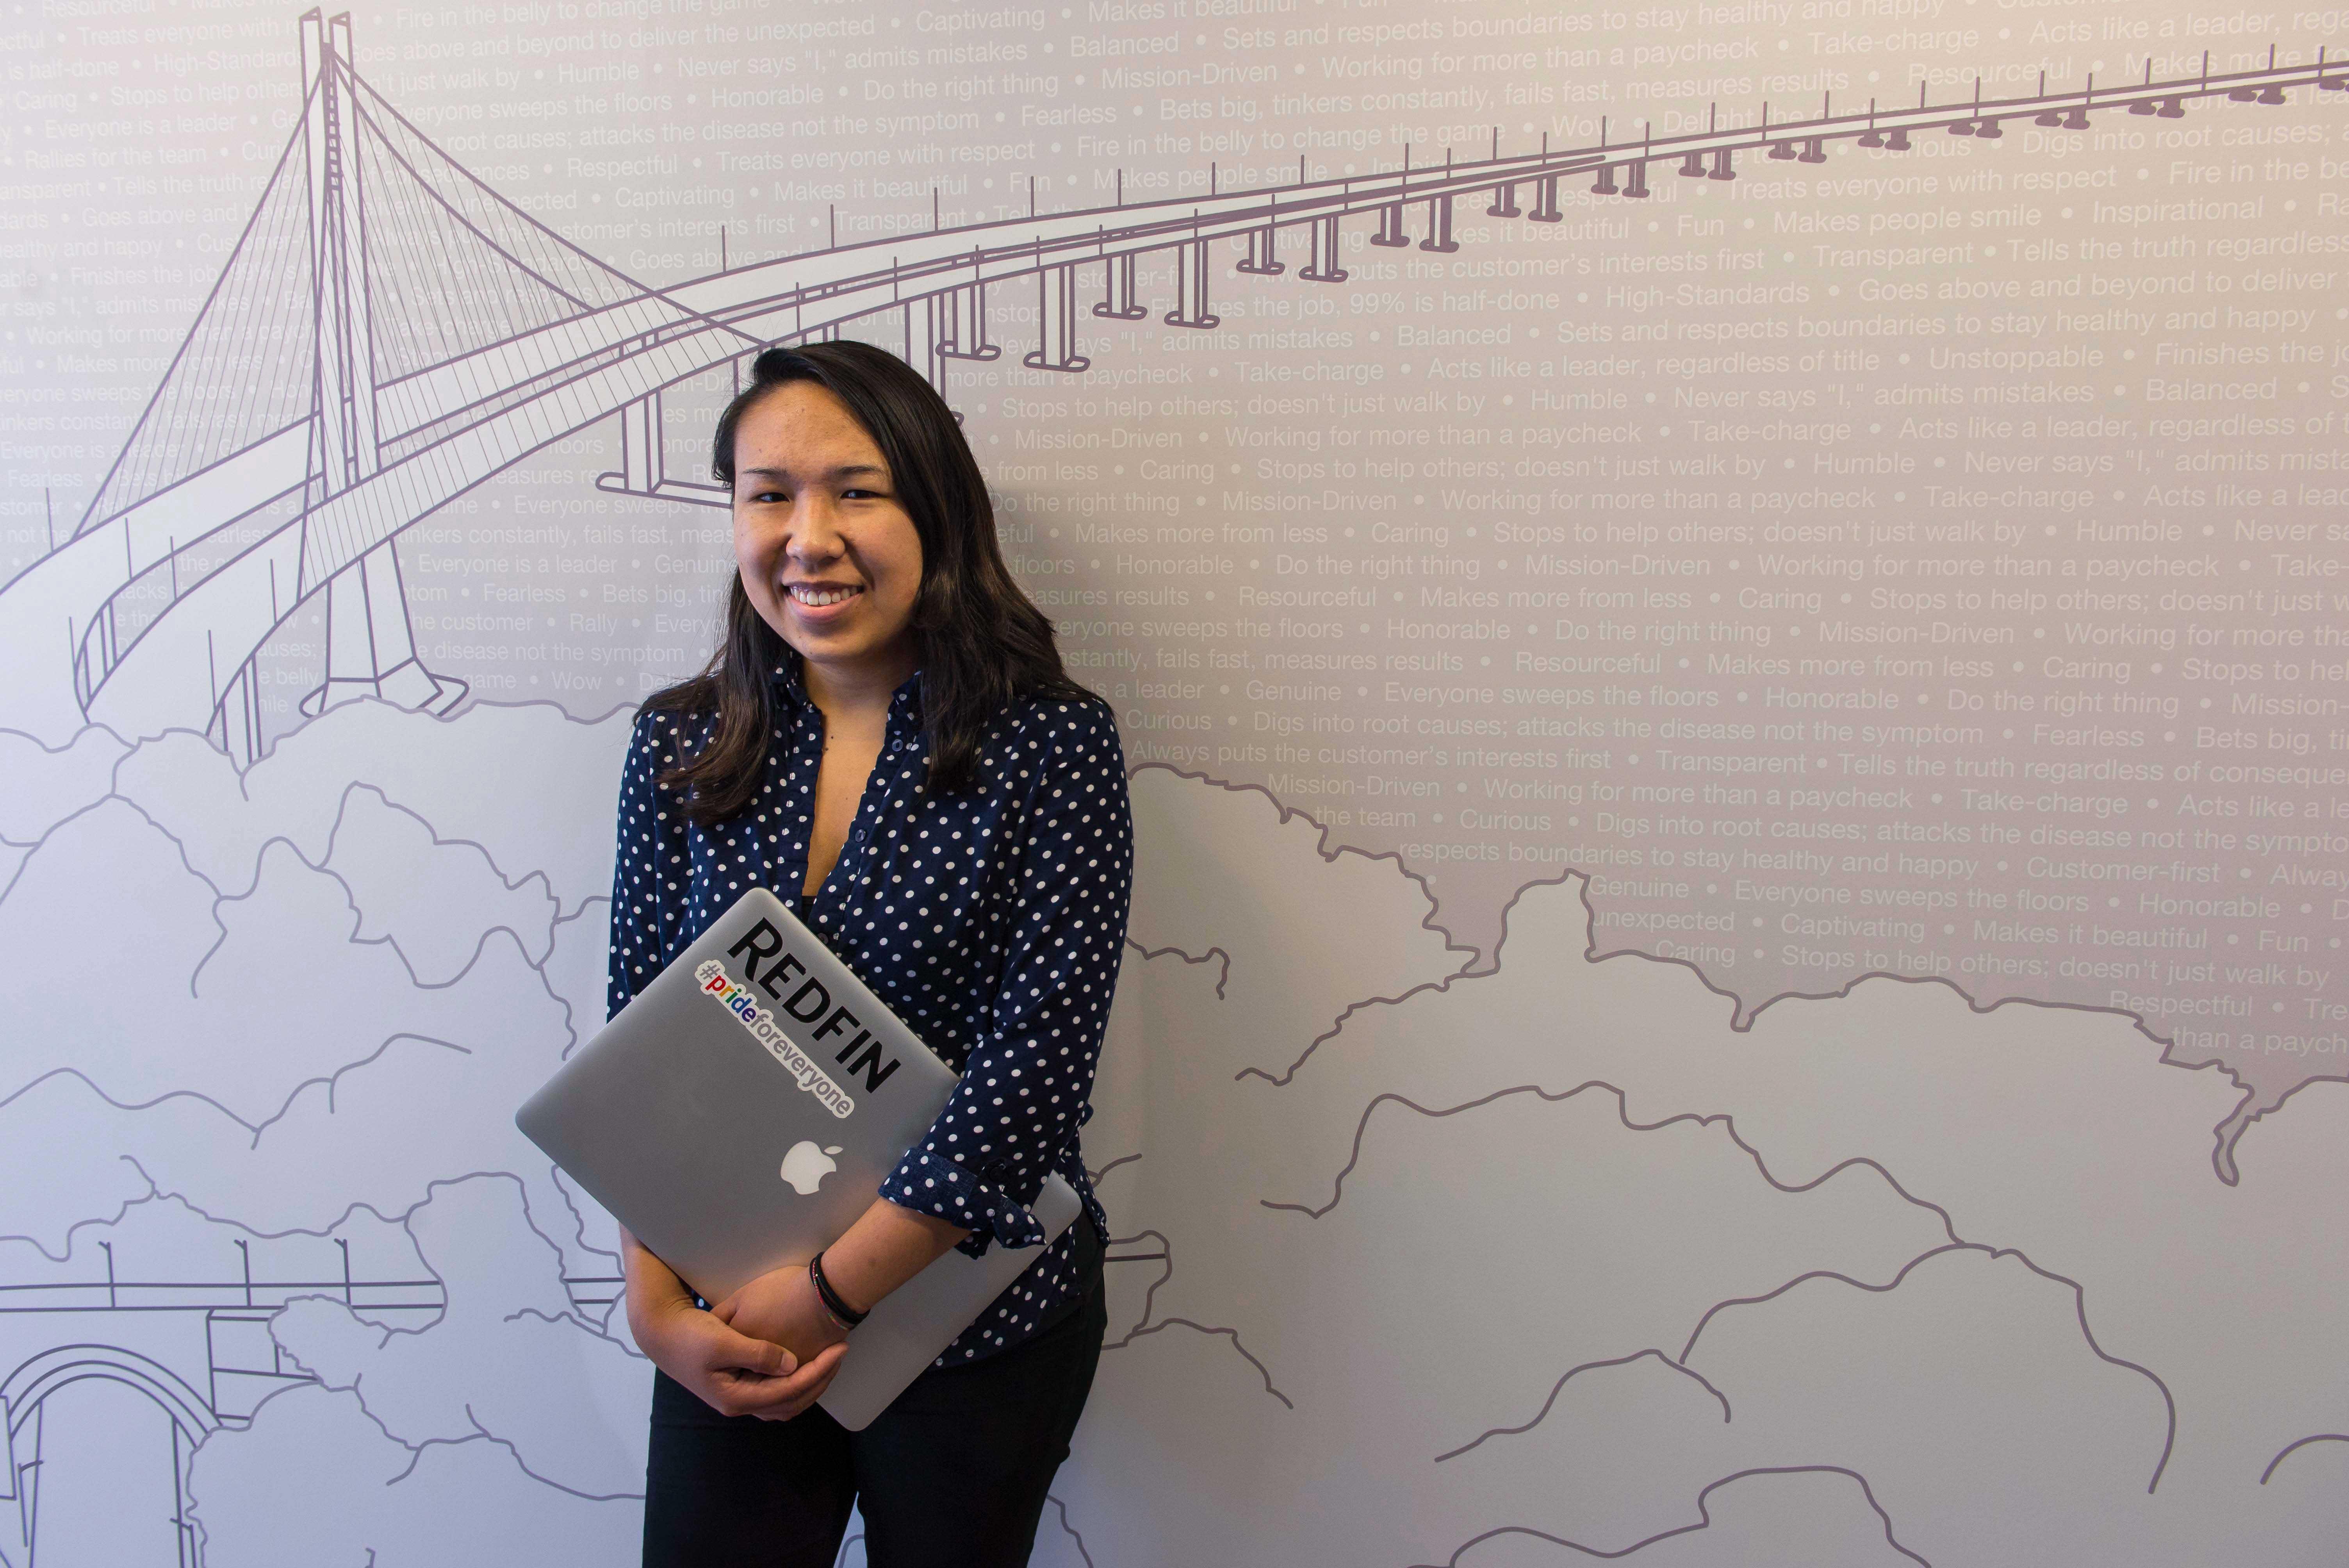 Meet the queer Latina helping diversify tech  